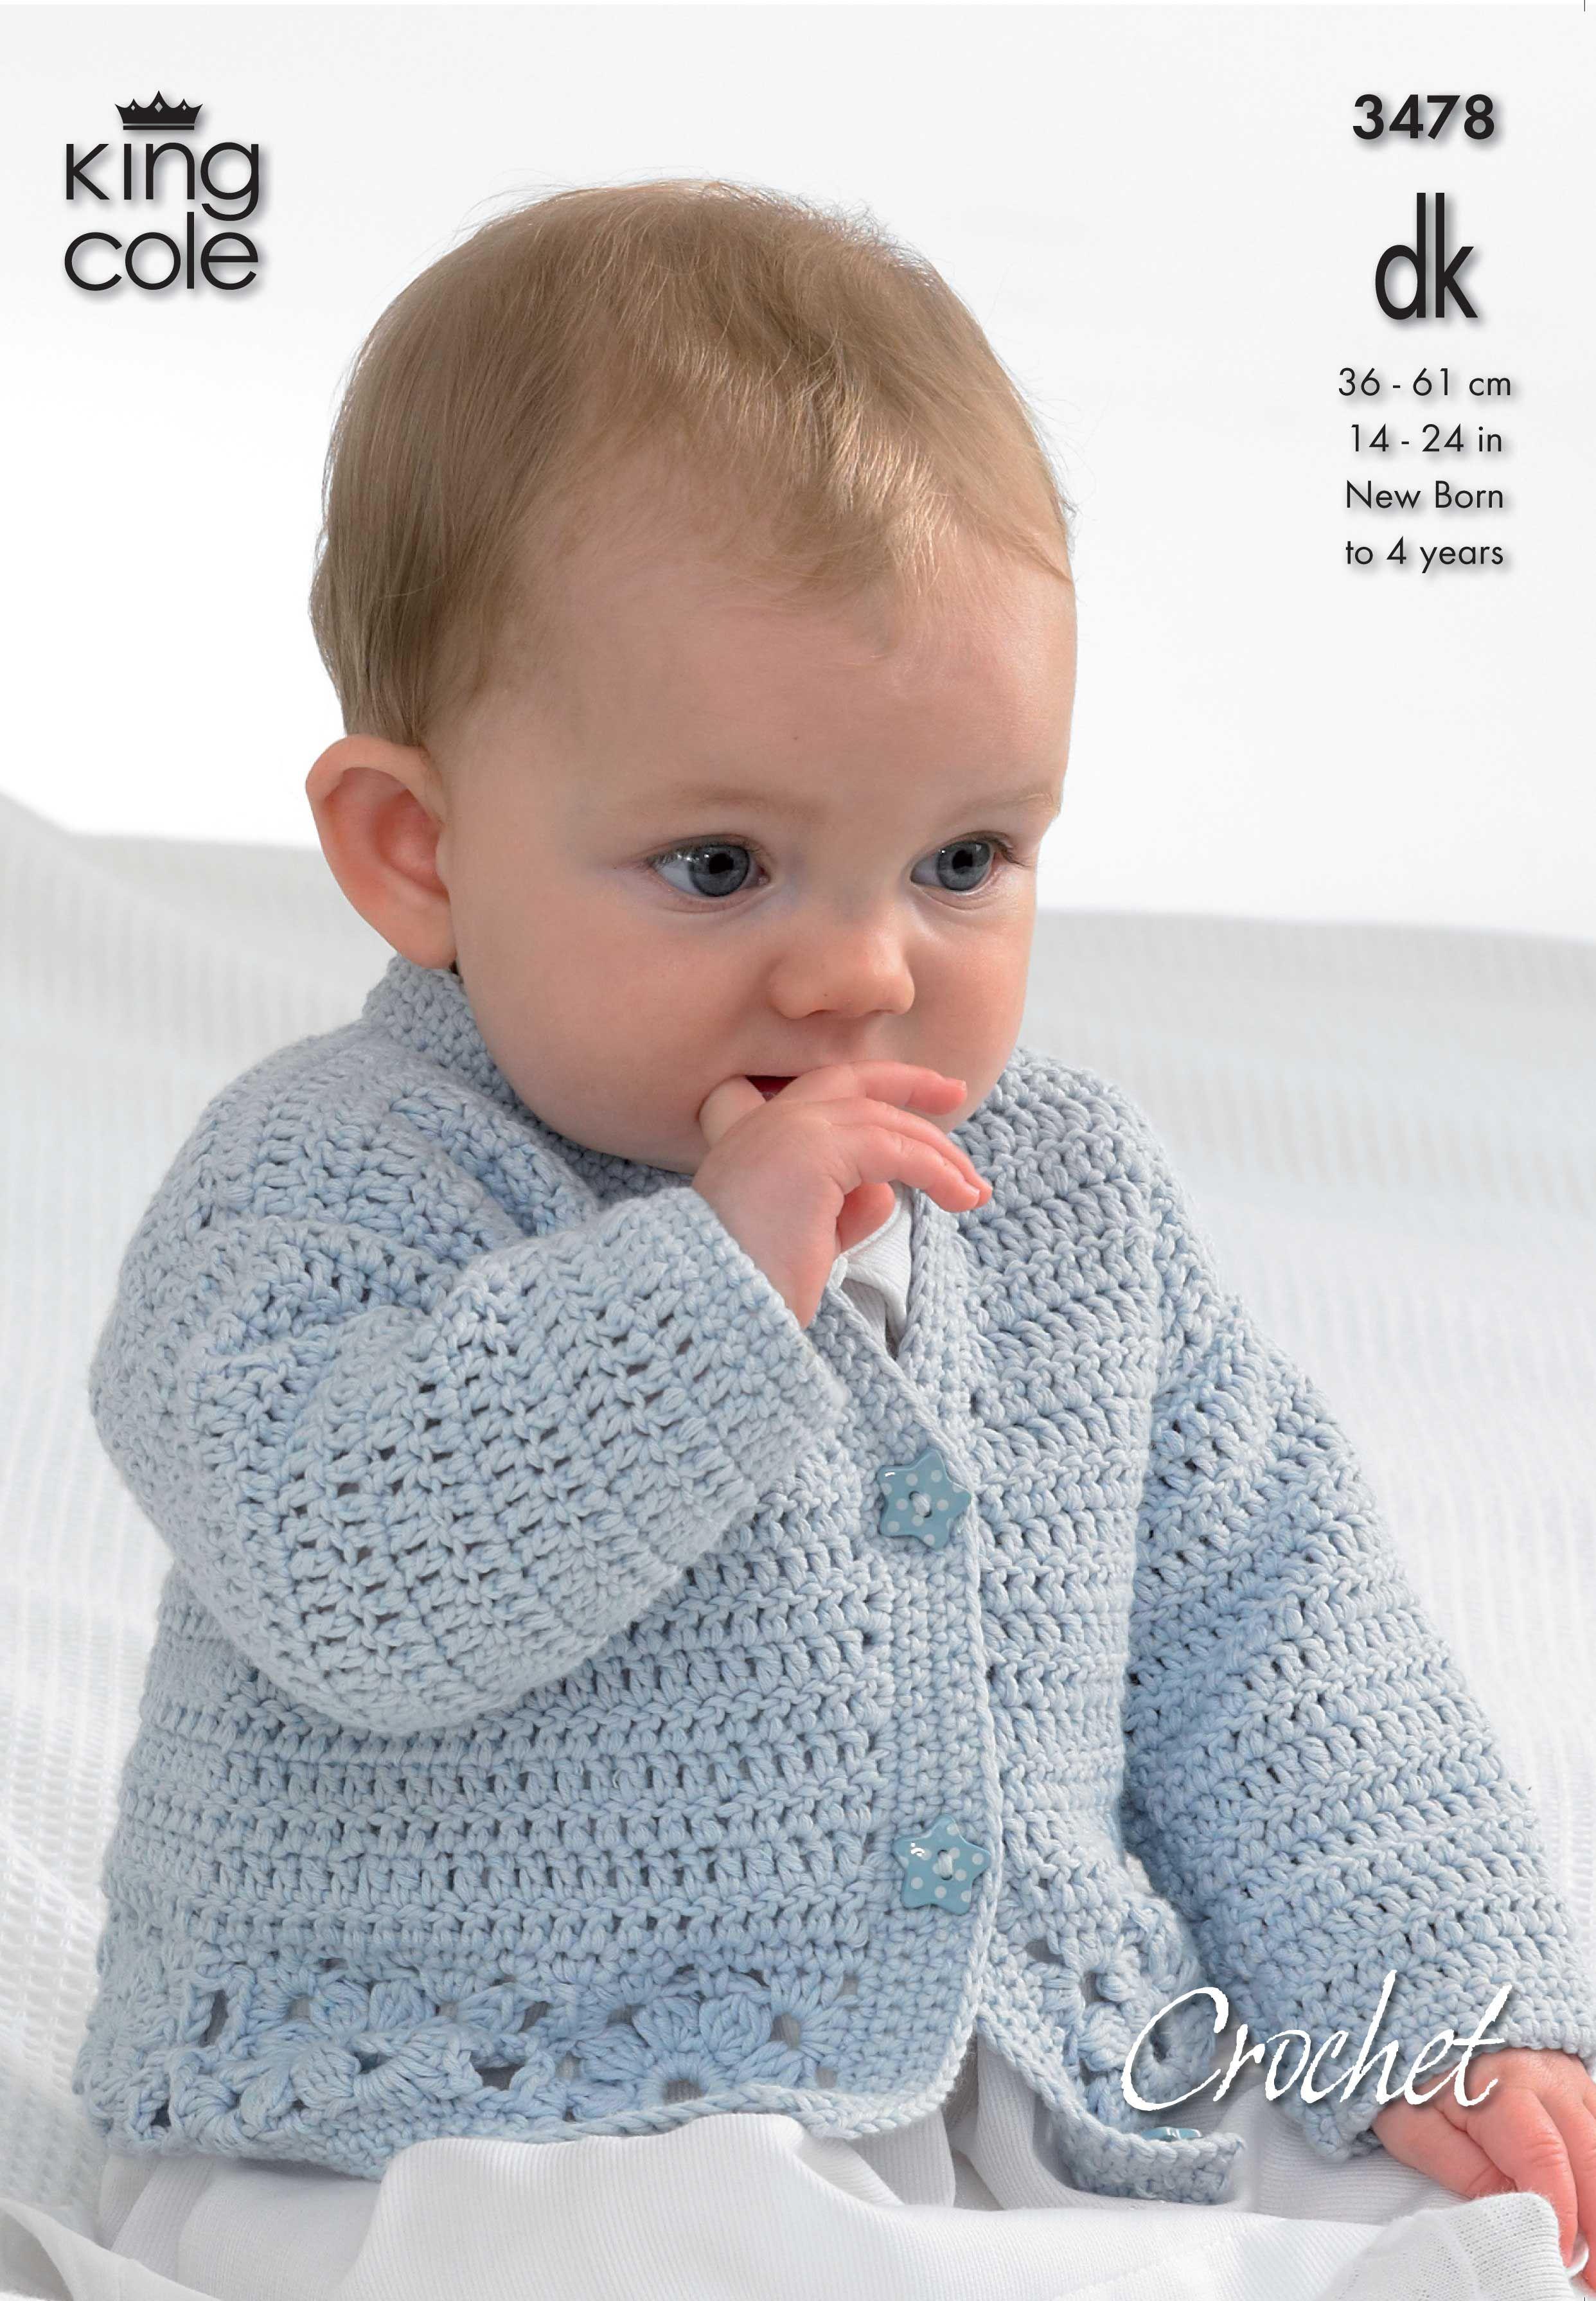 831d8c559 Crochet baby cardigan- King Cole